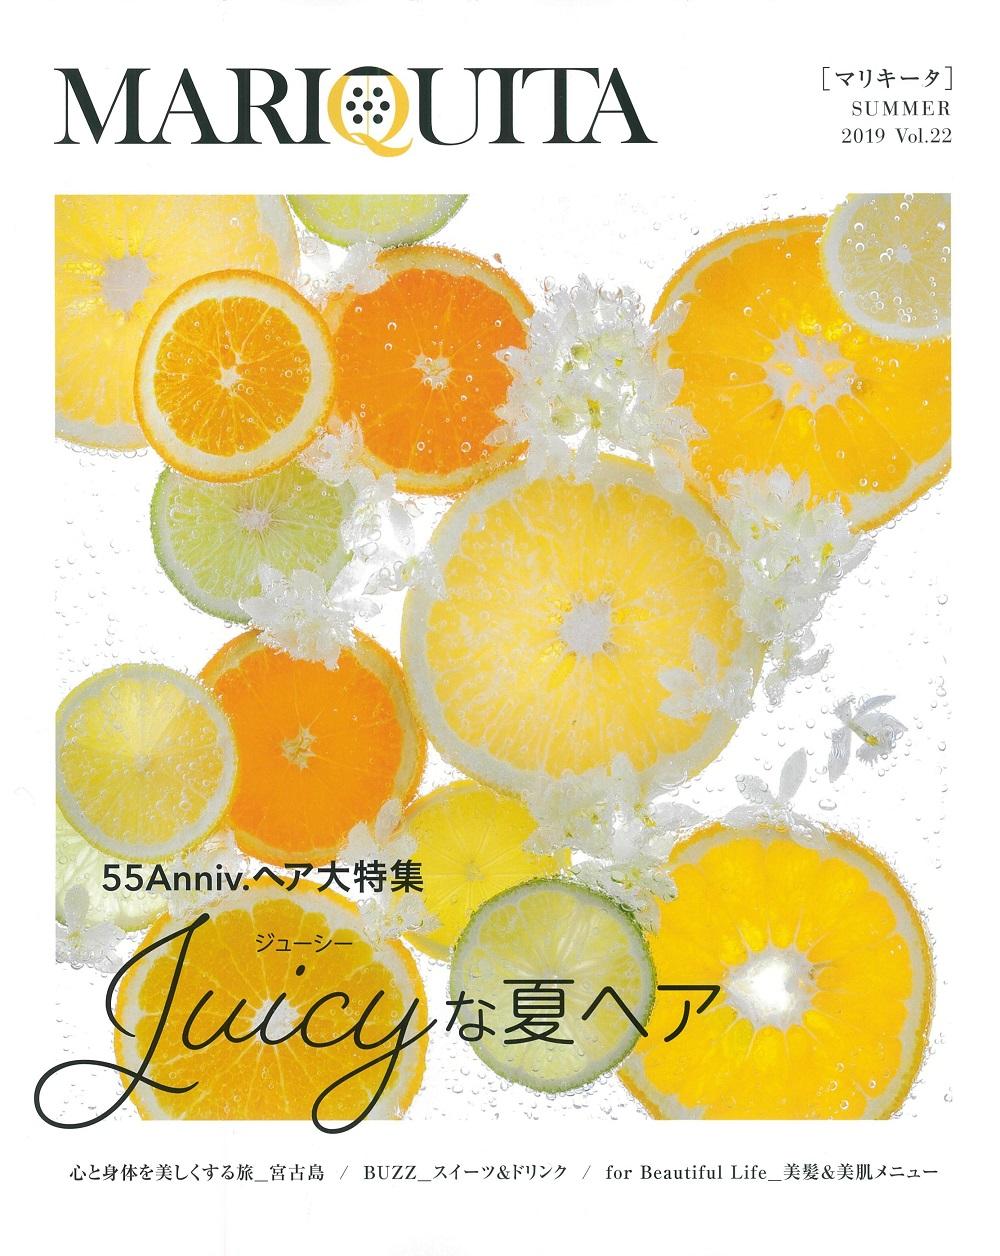 20190601_MARIQUITQ_COVER.jpg